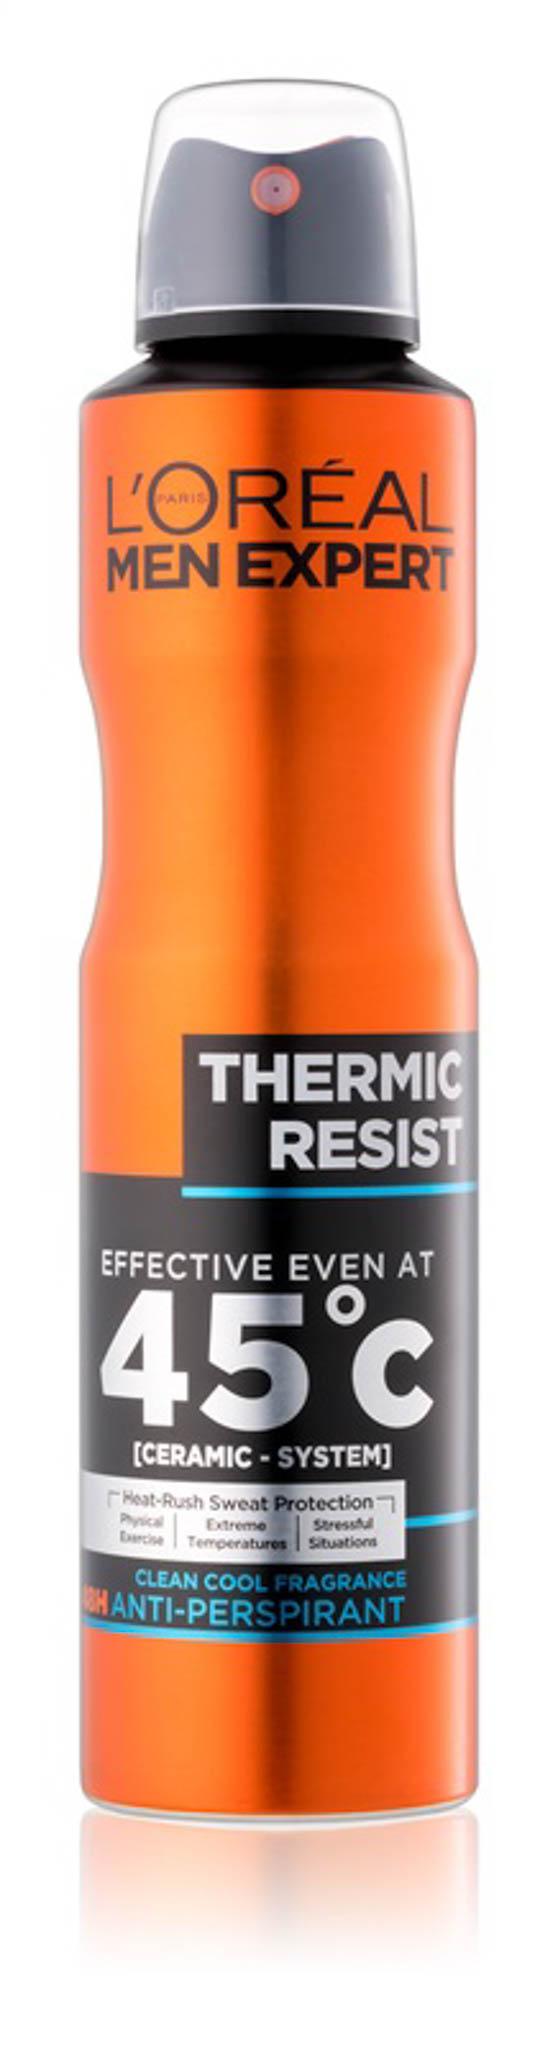 L'Oréal Paris Men Expert Thermic Resist antiperspirant sprej 150 ml